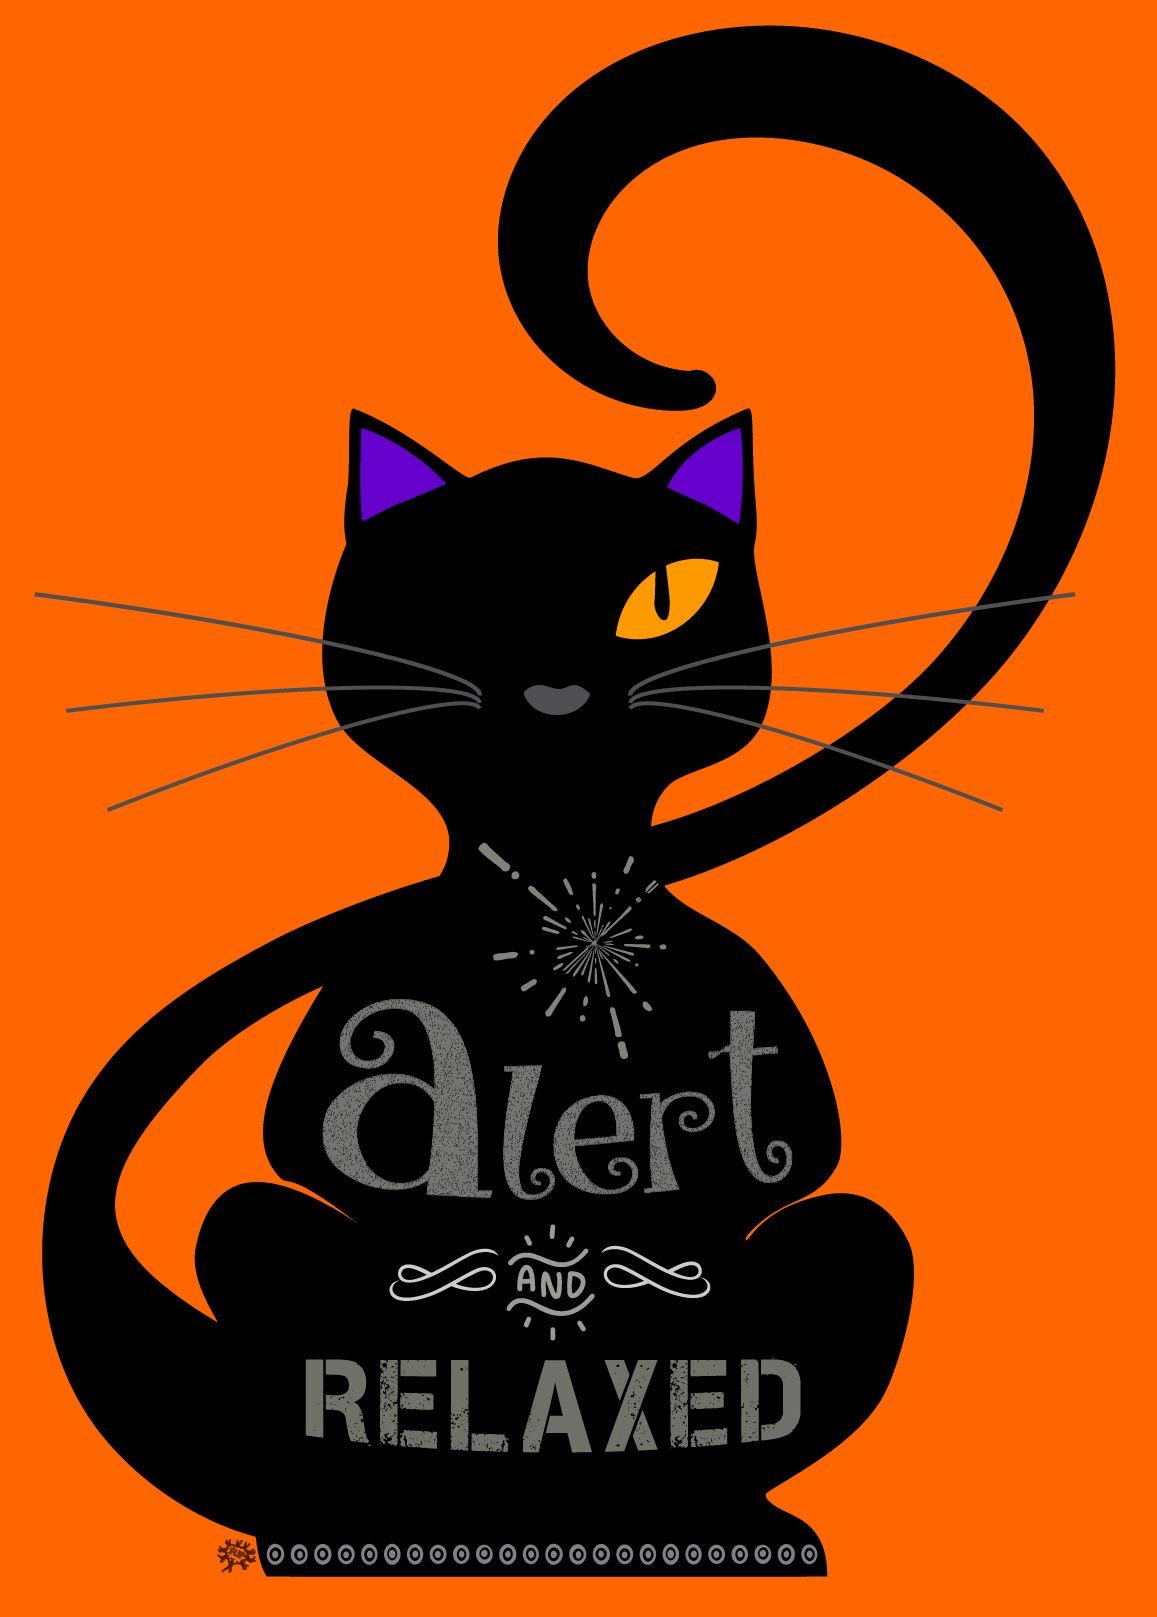 Cool cat. T shirt. Un gato alerta, pero relajado, sentado